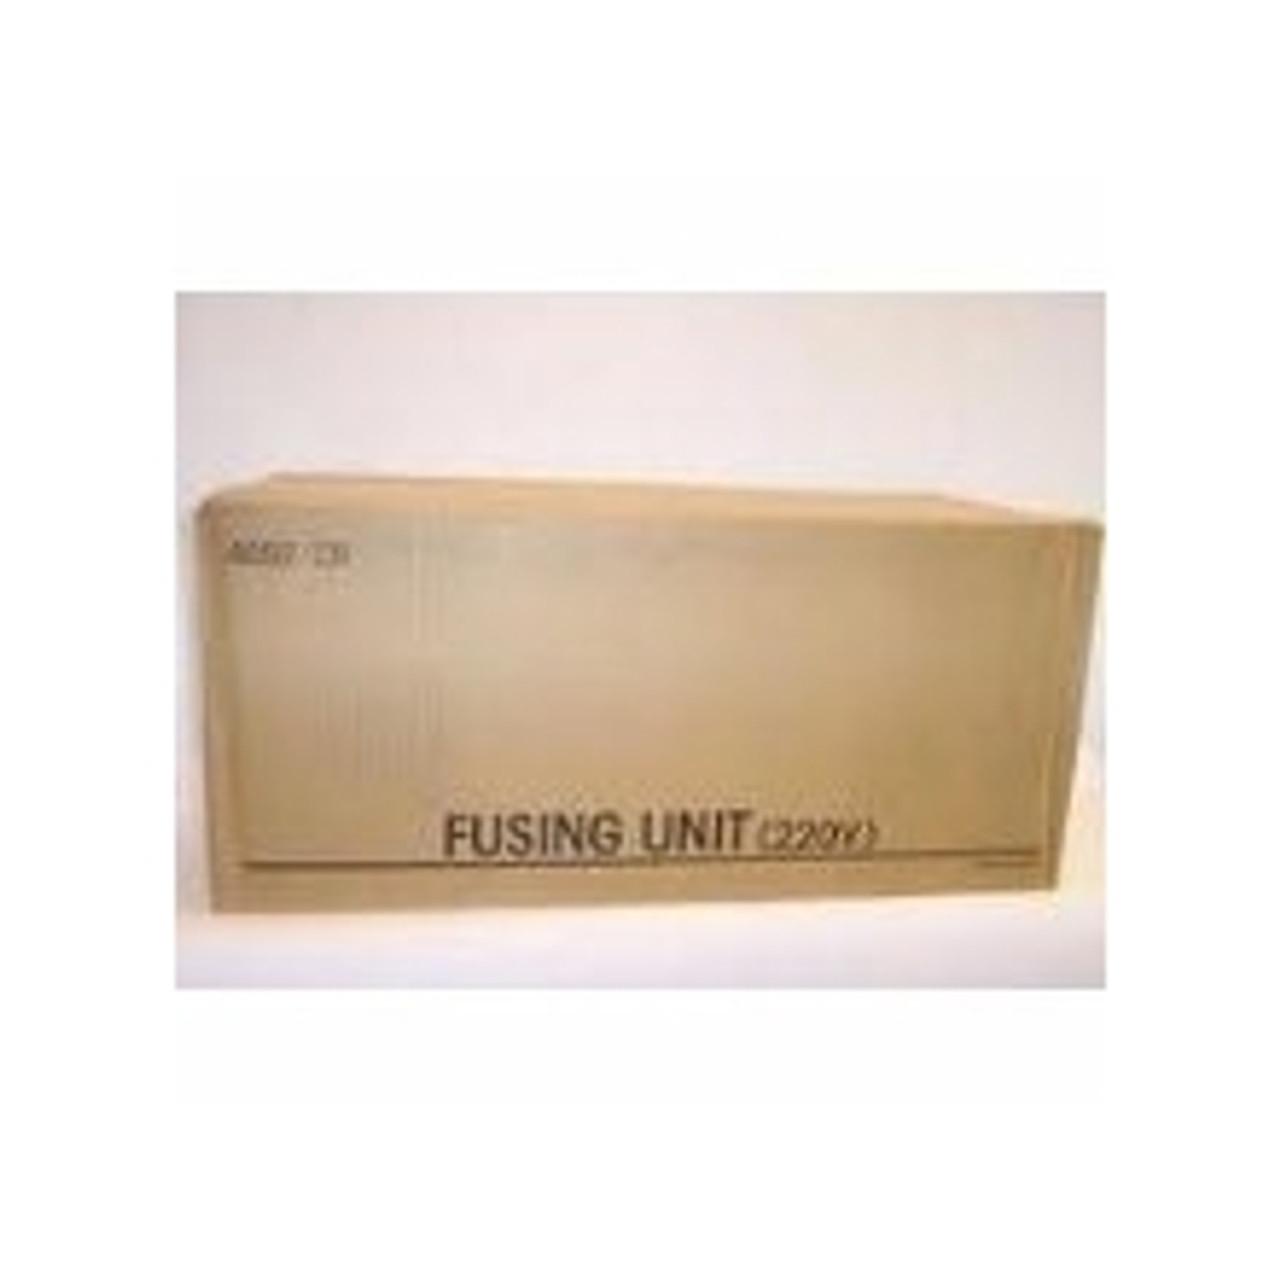 Brother Fusing Unit 220V LU7941001